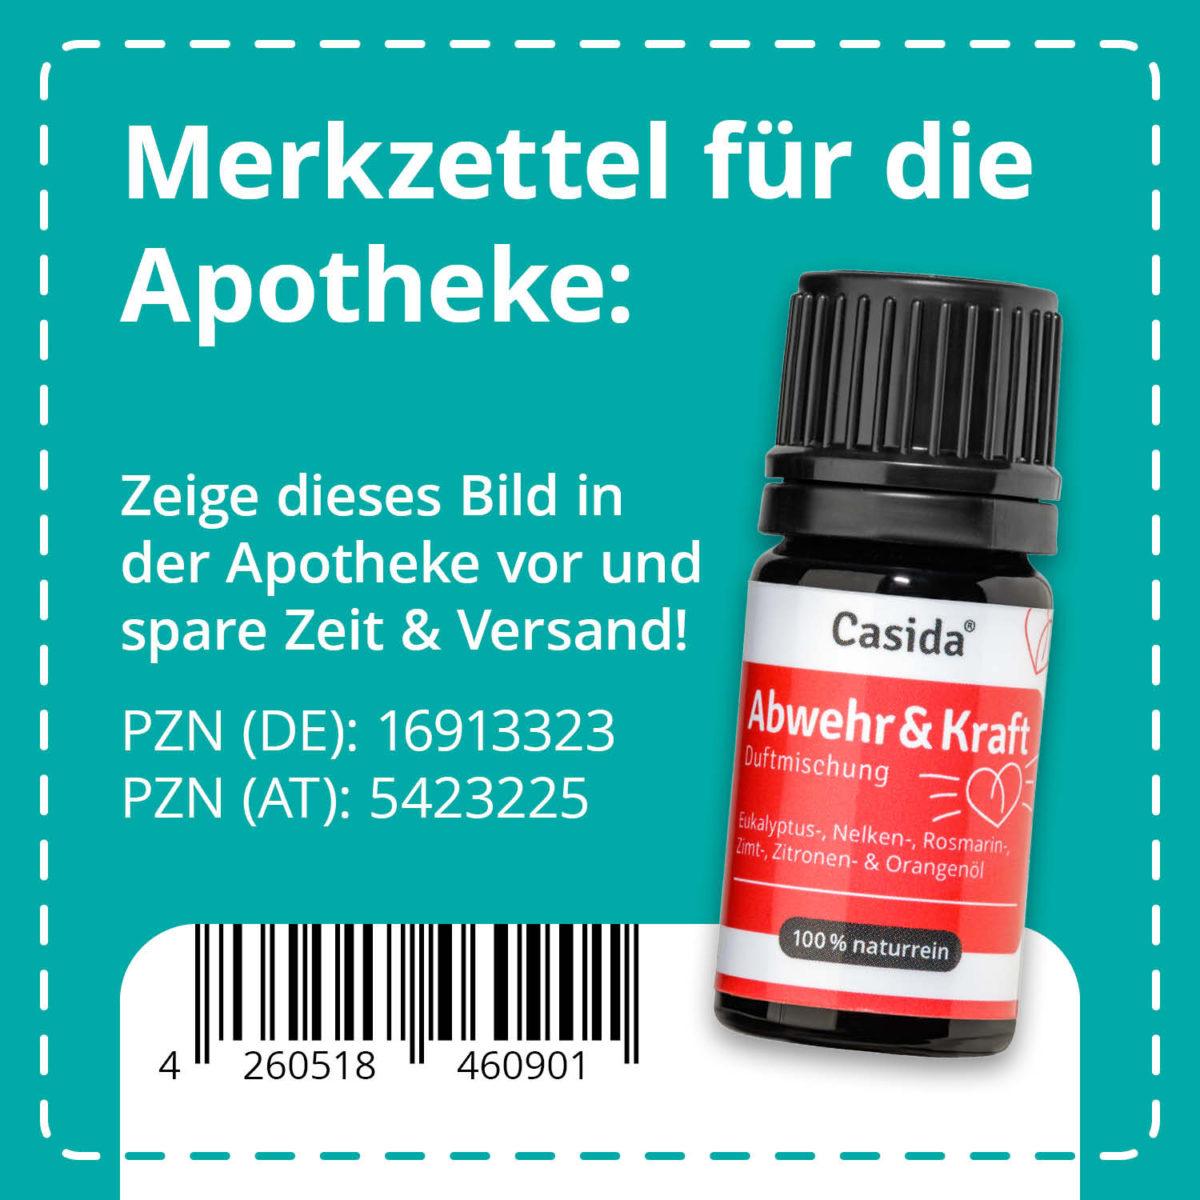 Casida Duftmischung Abwehr & Kraft – 5 ml 6 ml PZN DE 16913323 PZN AT 5423225 UVP 9,90 € EAN 4260518460901